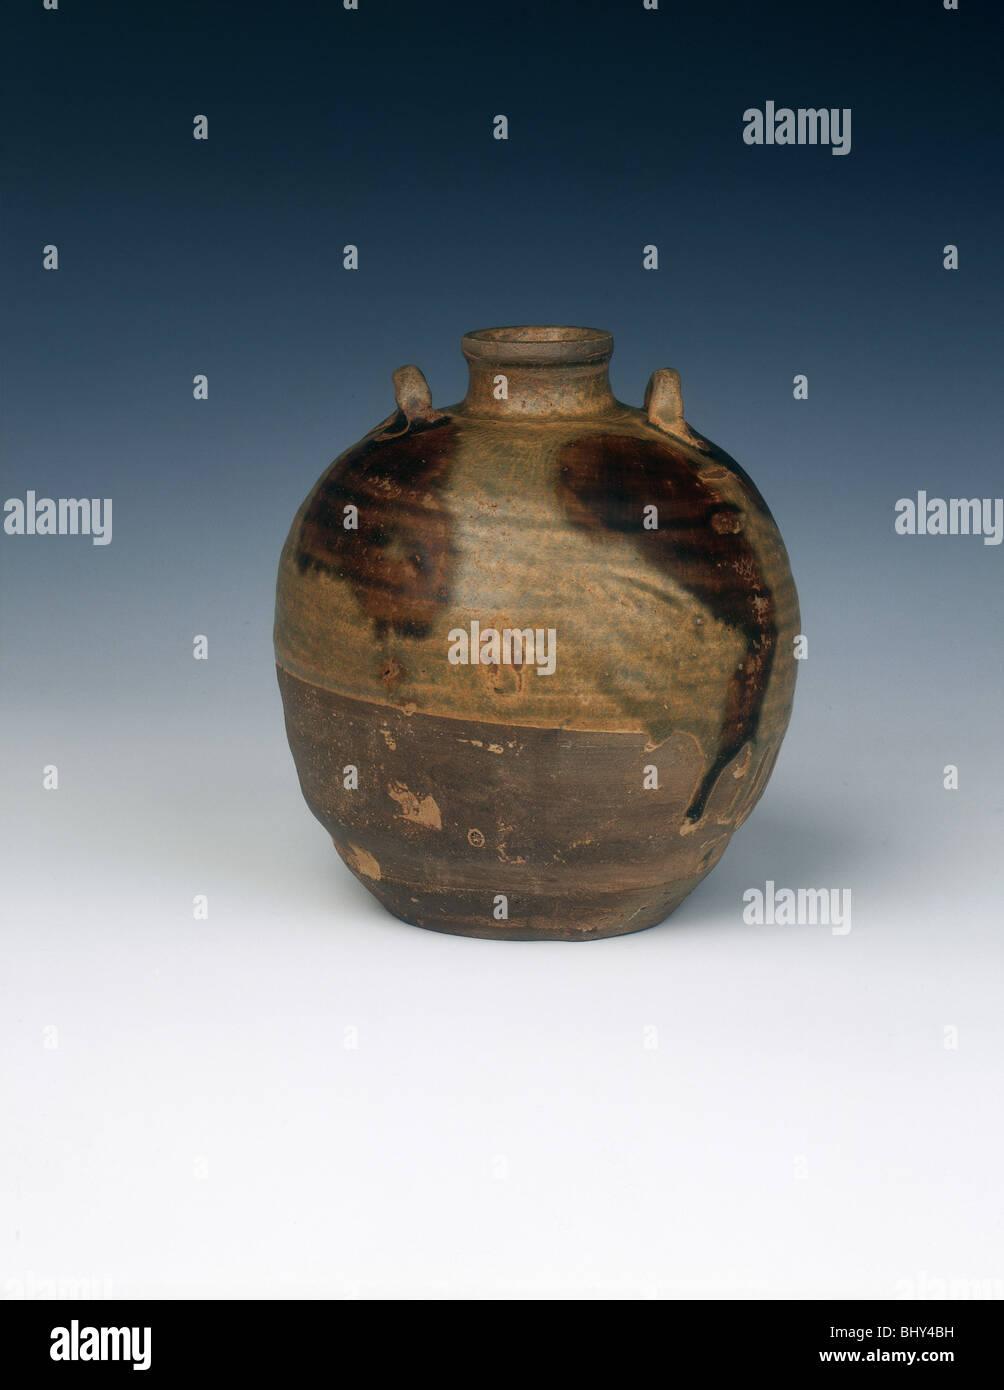 Changsha stoneware jar, Late Tang or Five Dynasties, China, 9th-10th century. - Stock Image